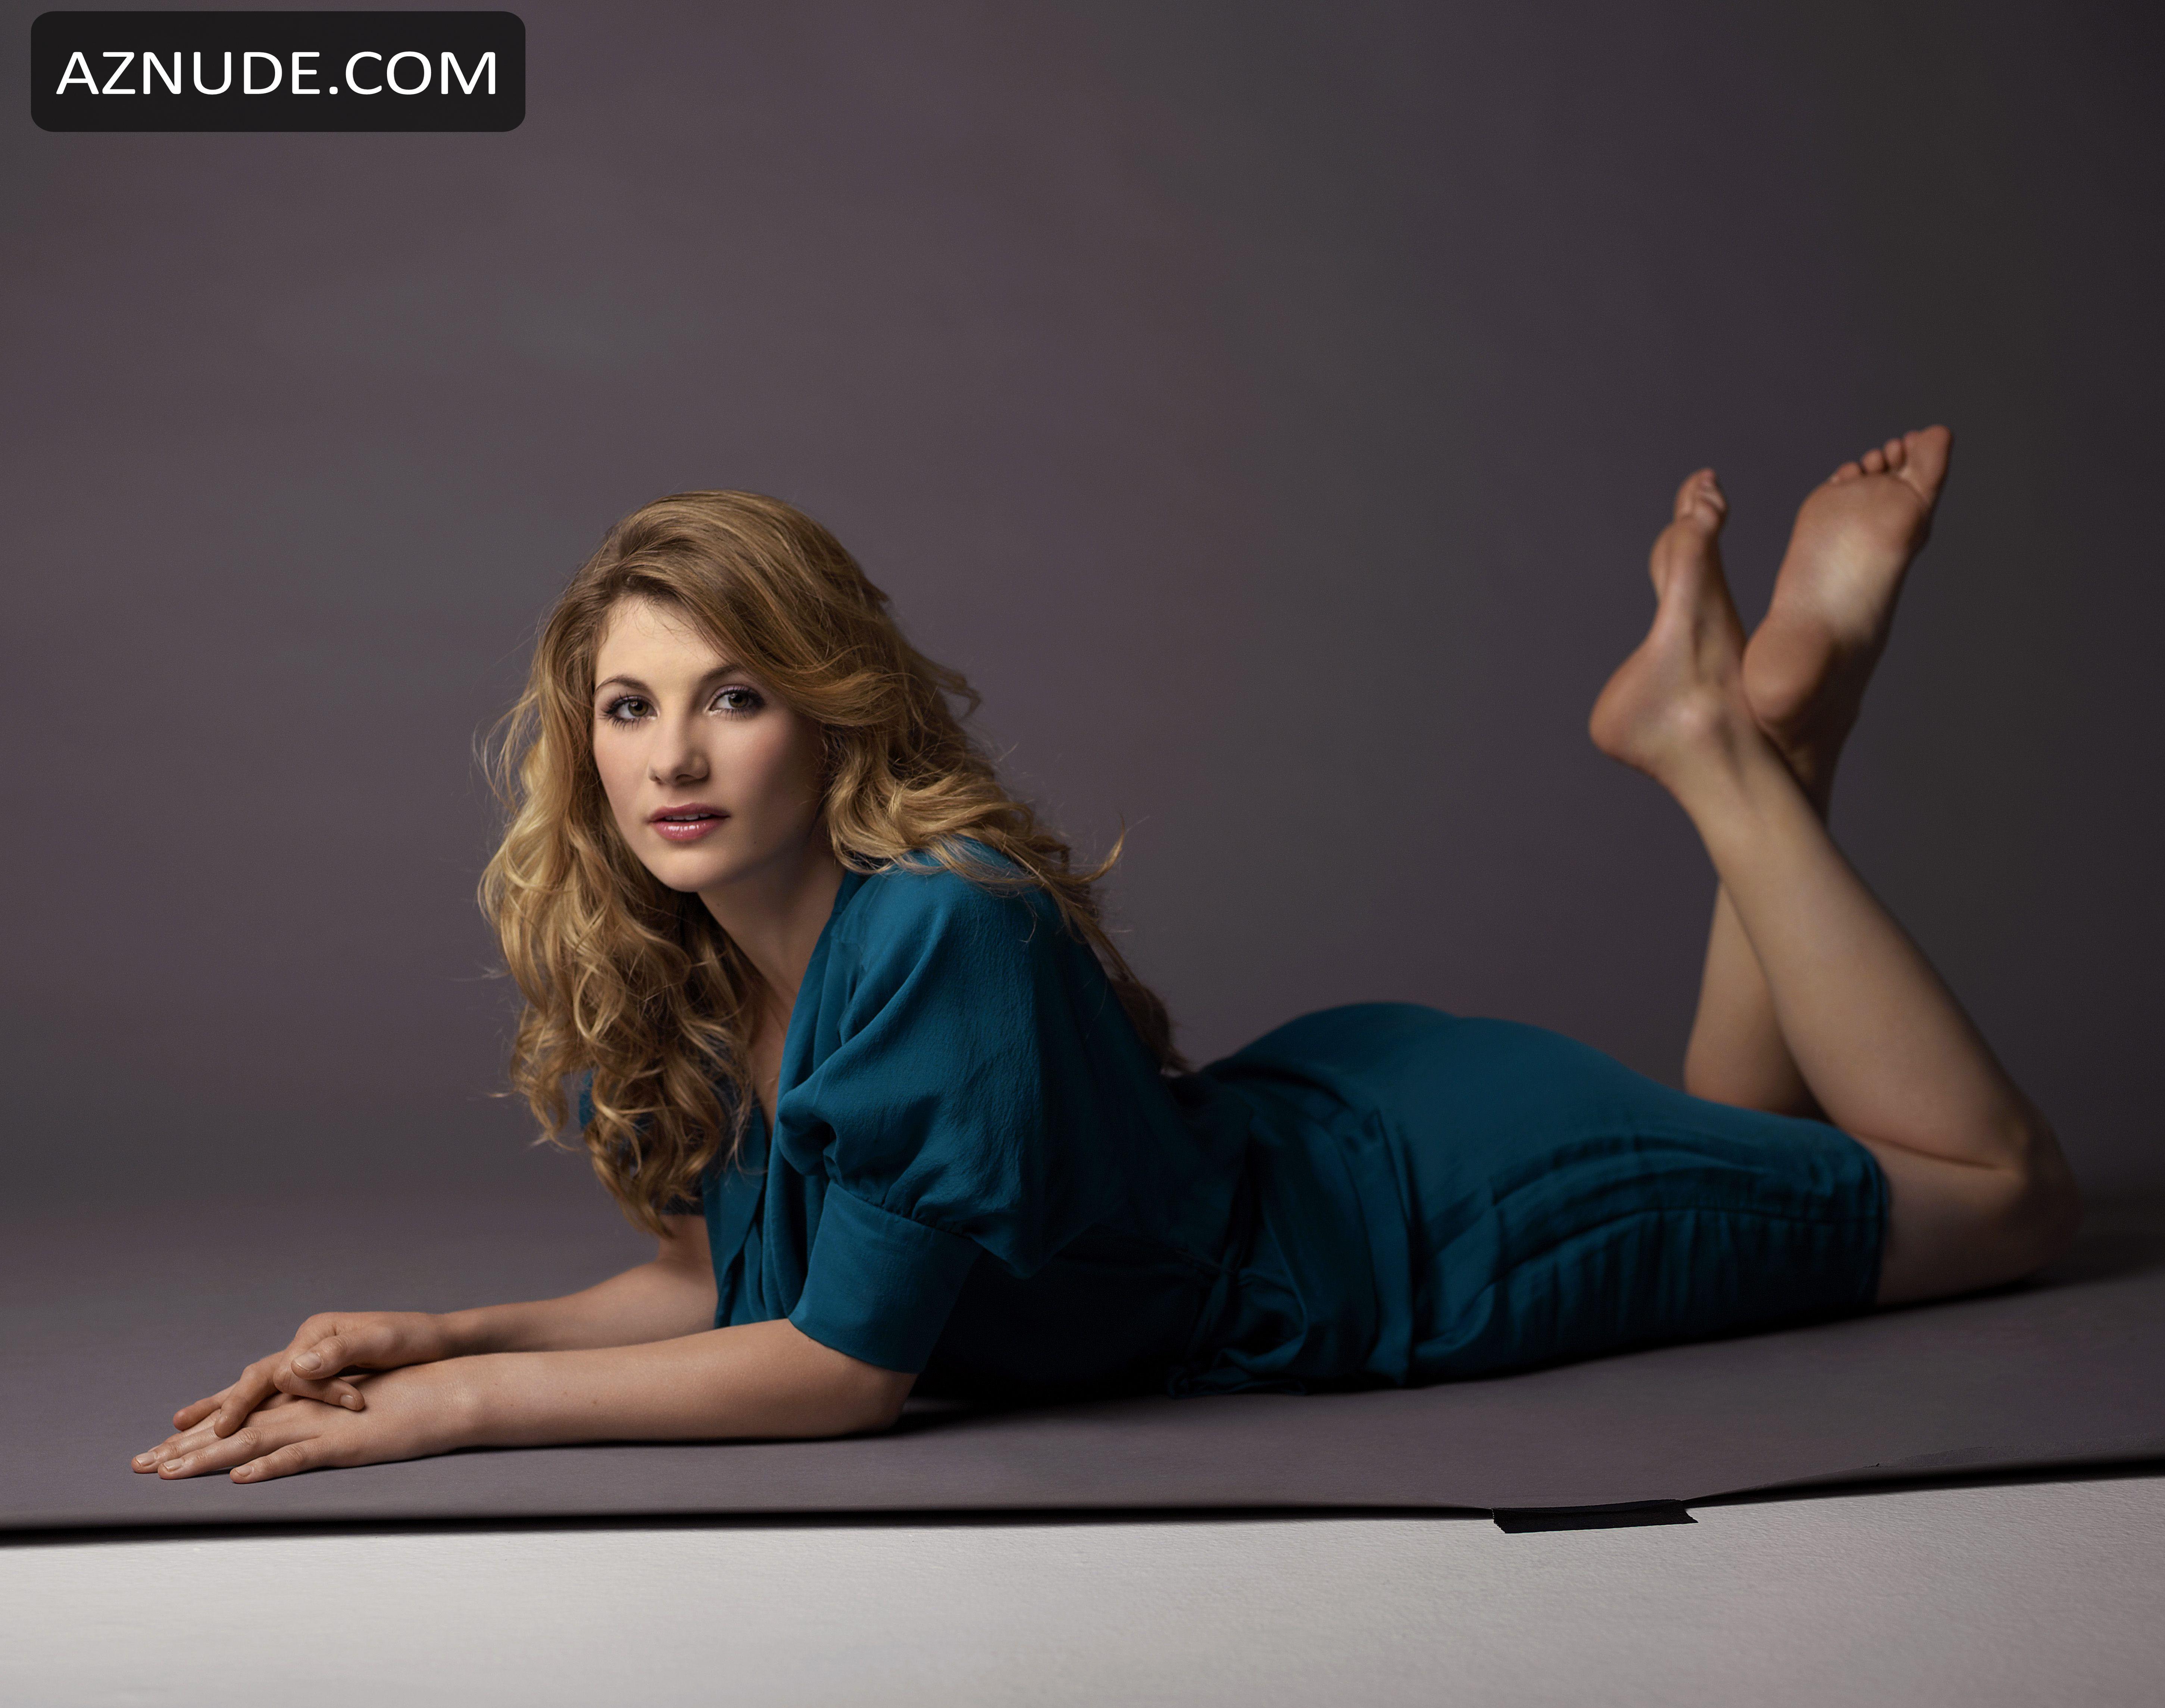 jodie whittaker nude